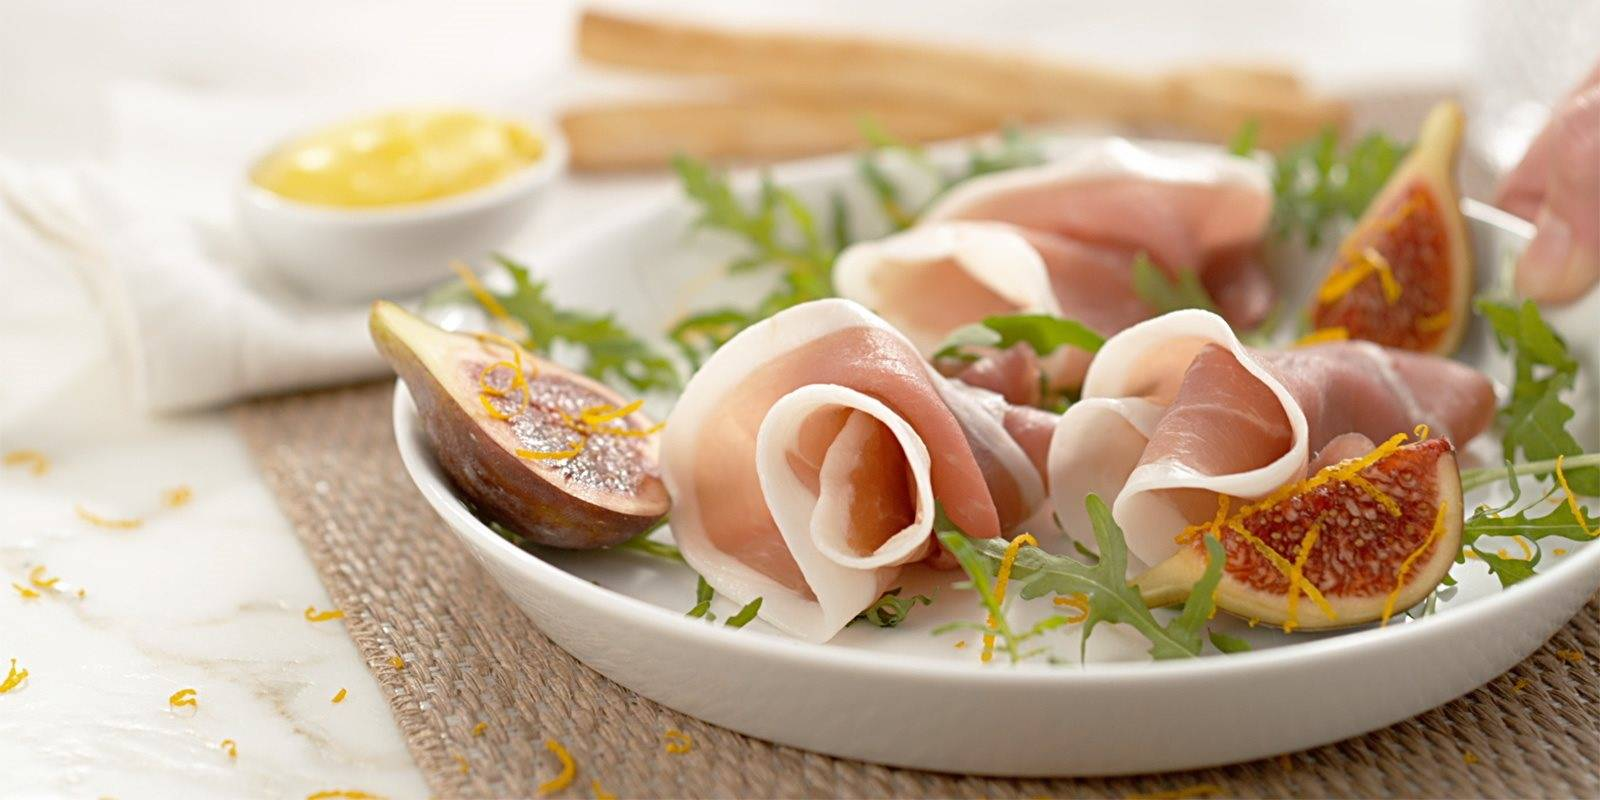 San Daniele Dop Cured Ham